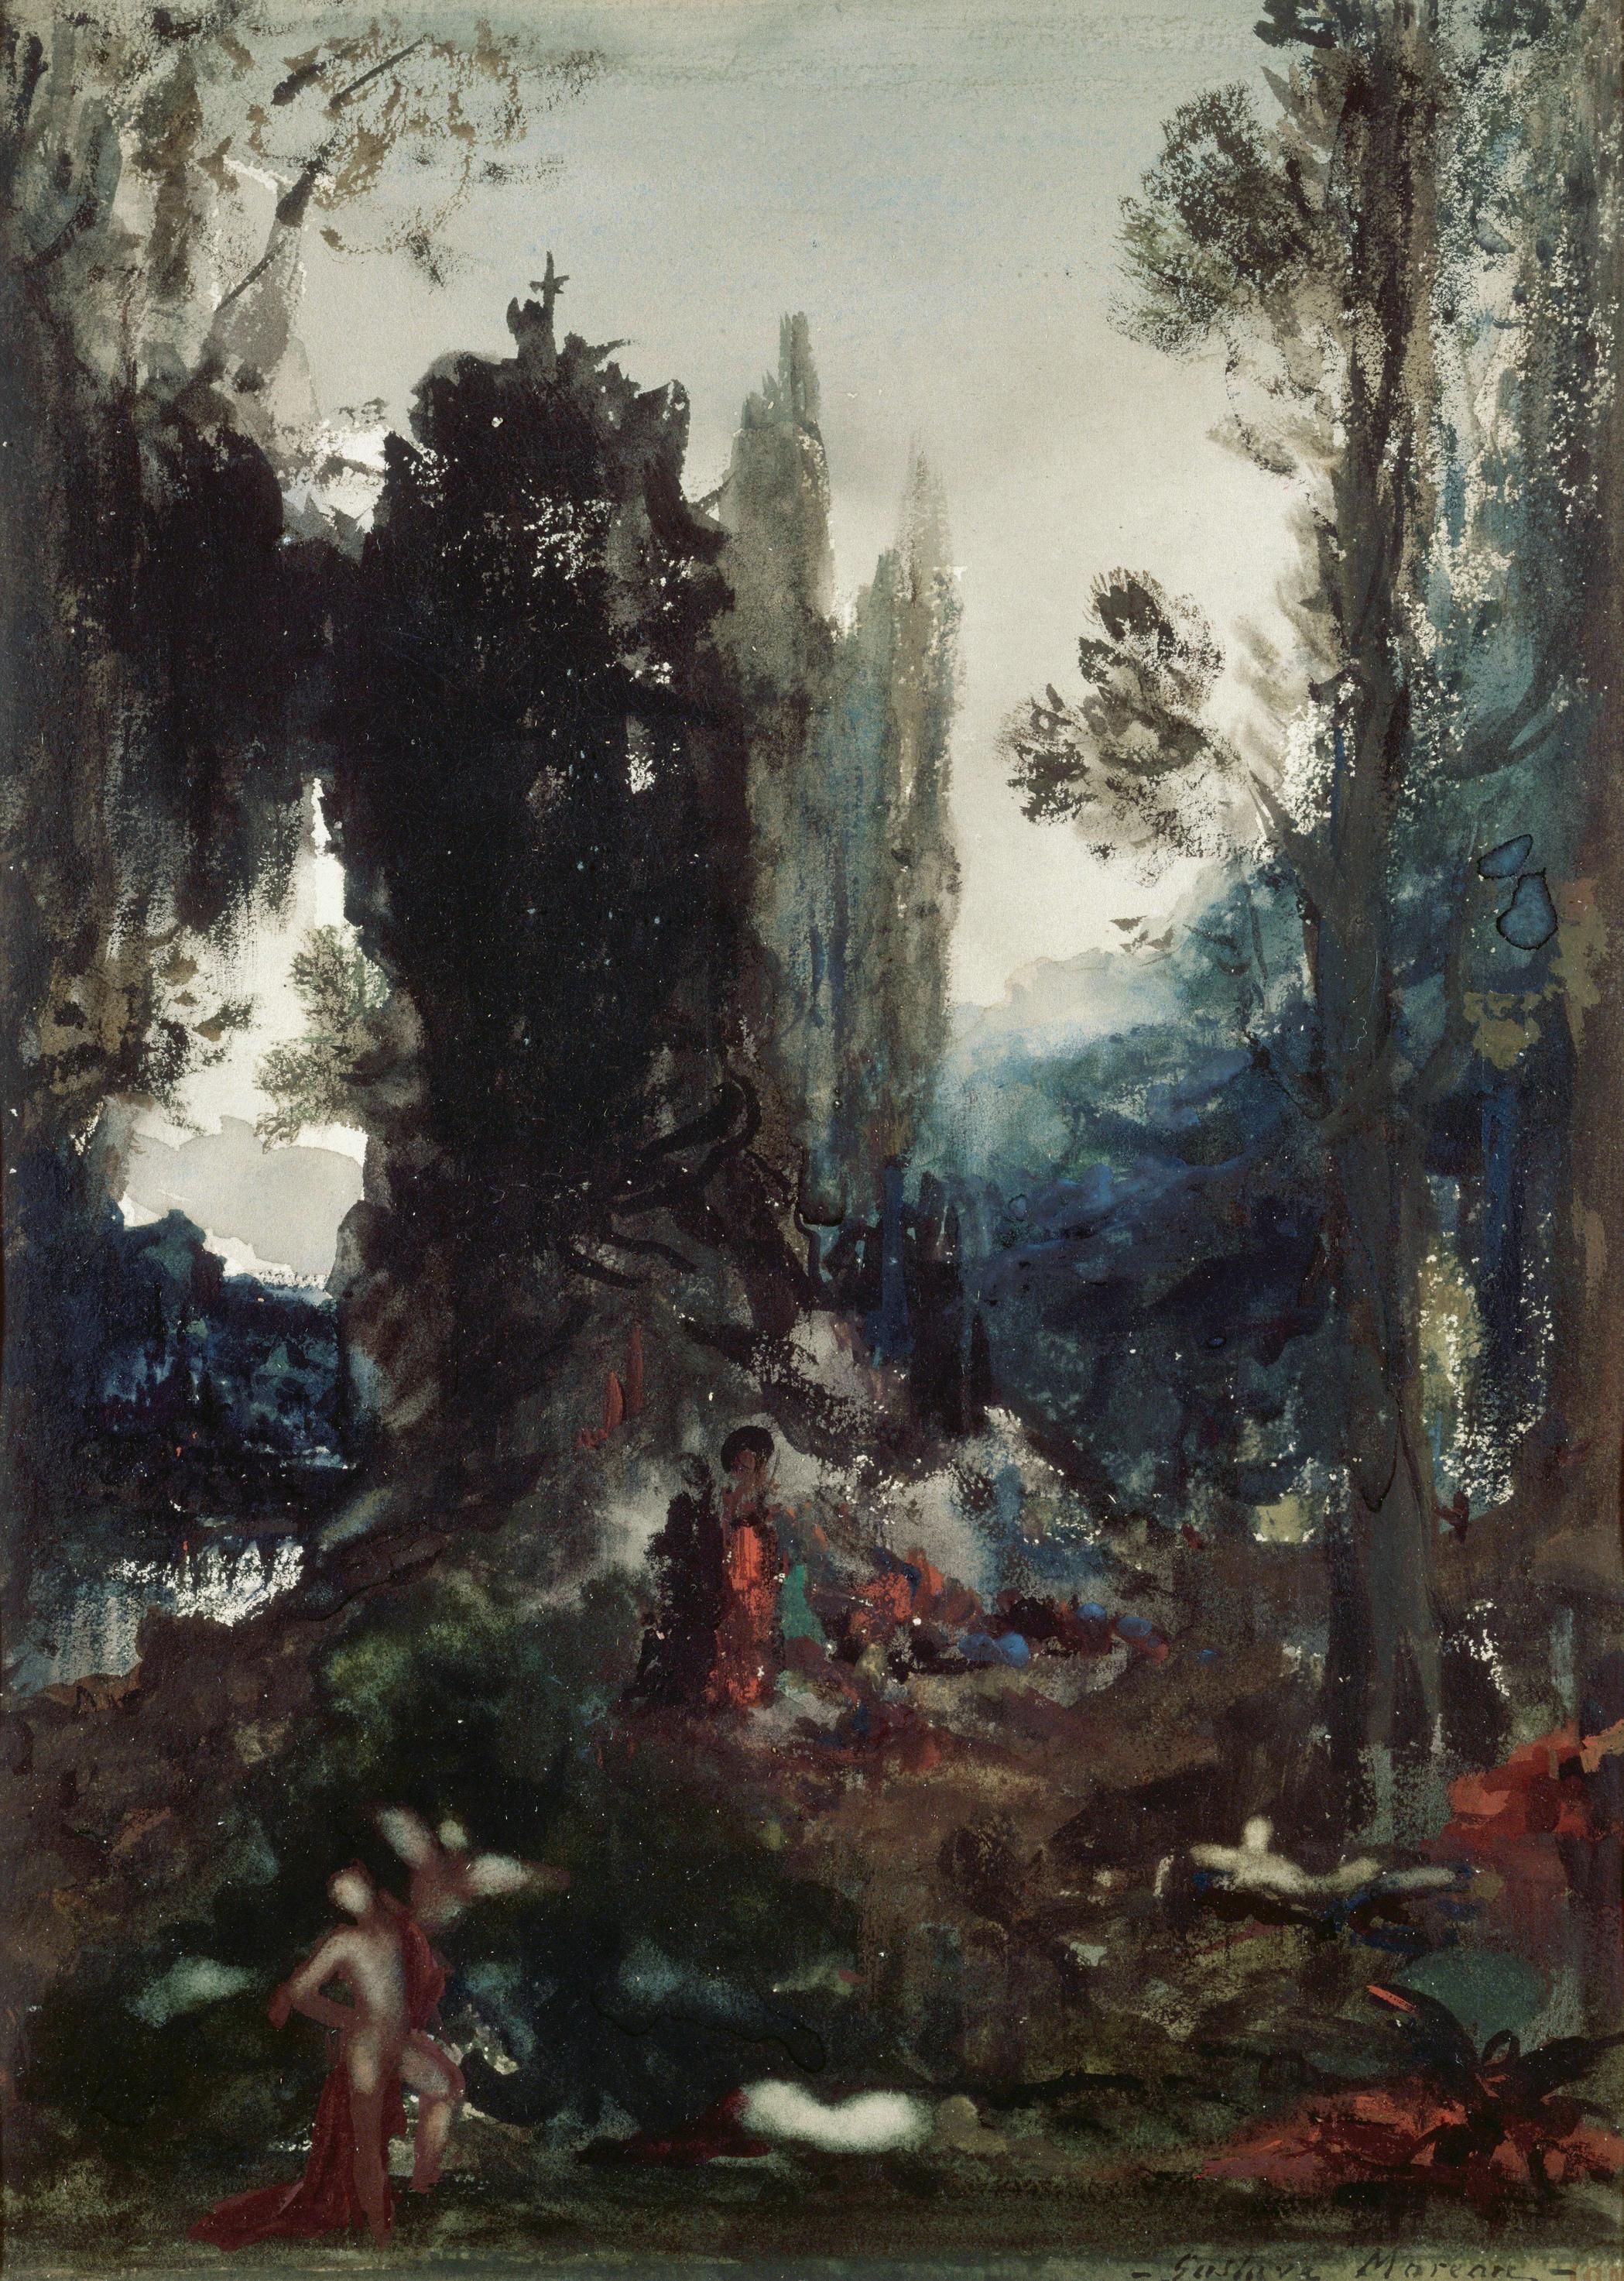 Химеры (33.4 х 24.5 см) (гуашь) (Париж, музей Гюстава Моро)